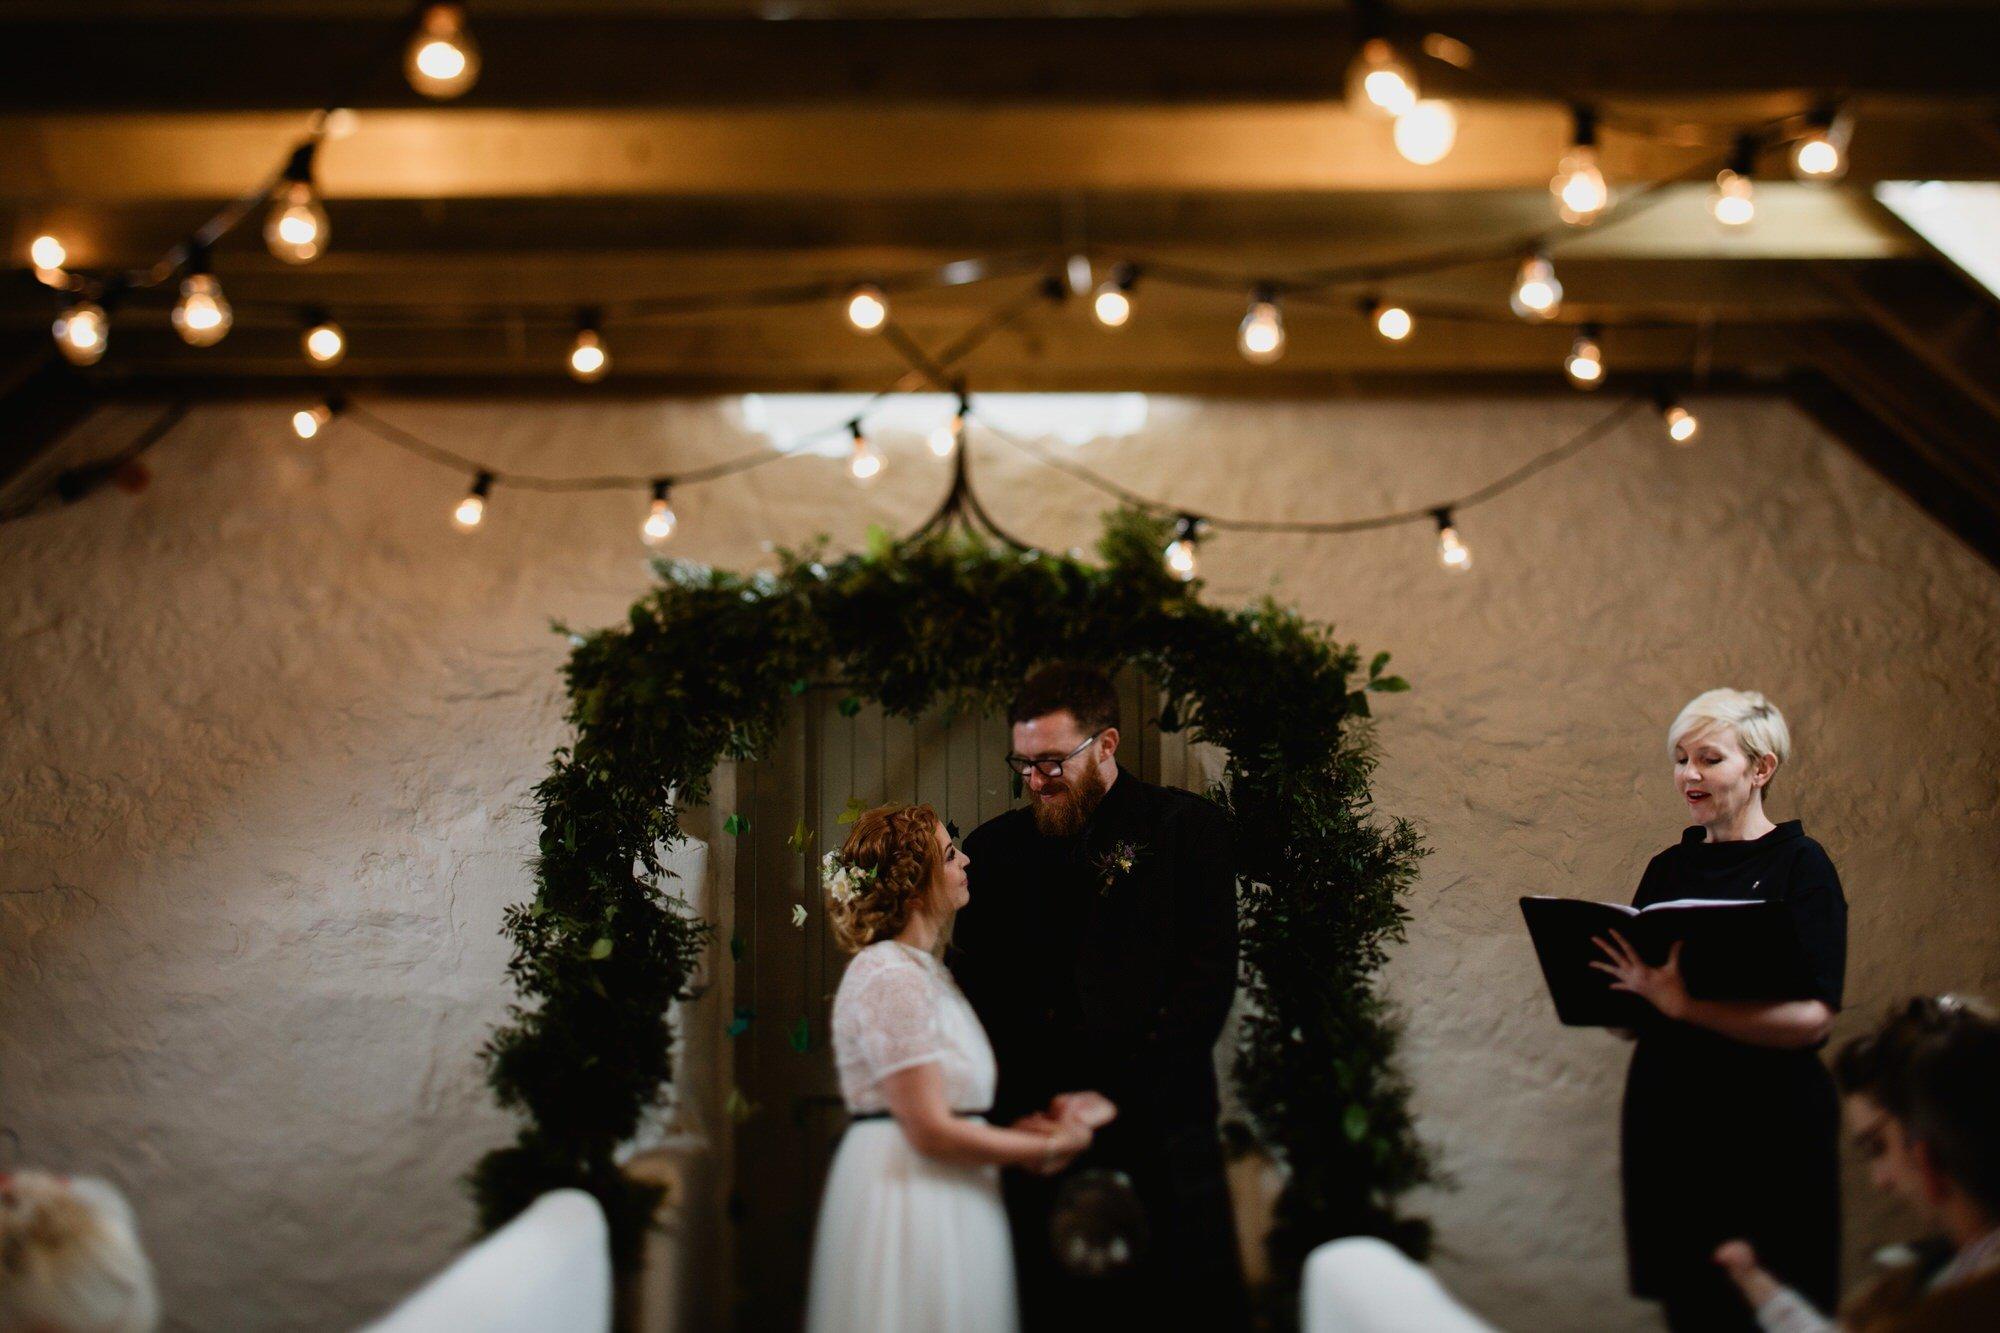 024 STONE BOTHY CEREMONY TIN SHED KNOCKRAICH WEDDING AUSTRIAN SCOTTISH ZOE ALEXANDRA PHOTOGRAPHY